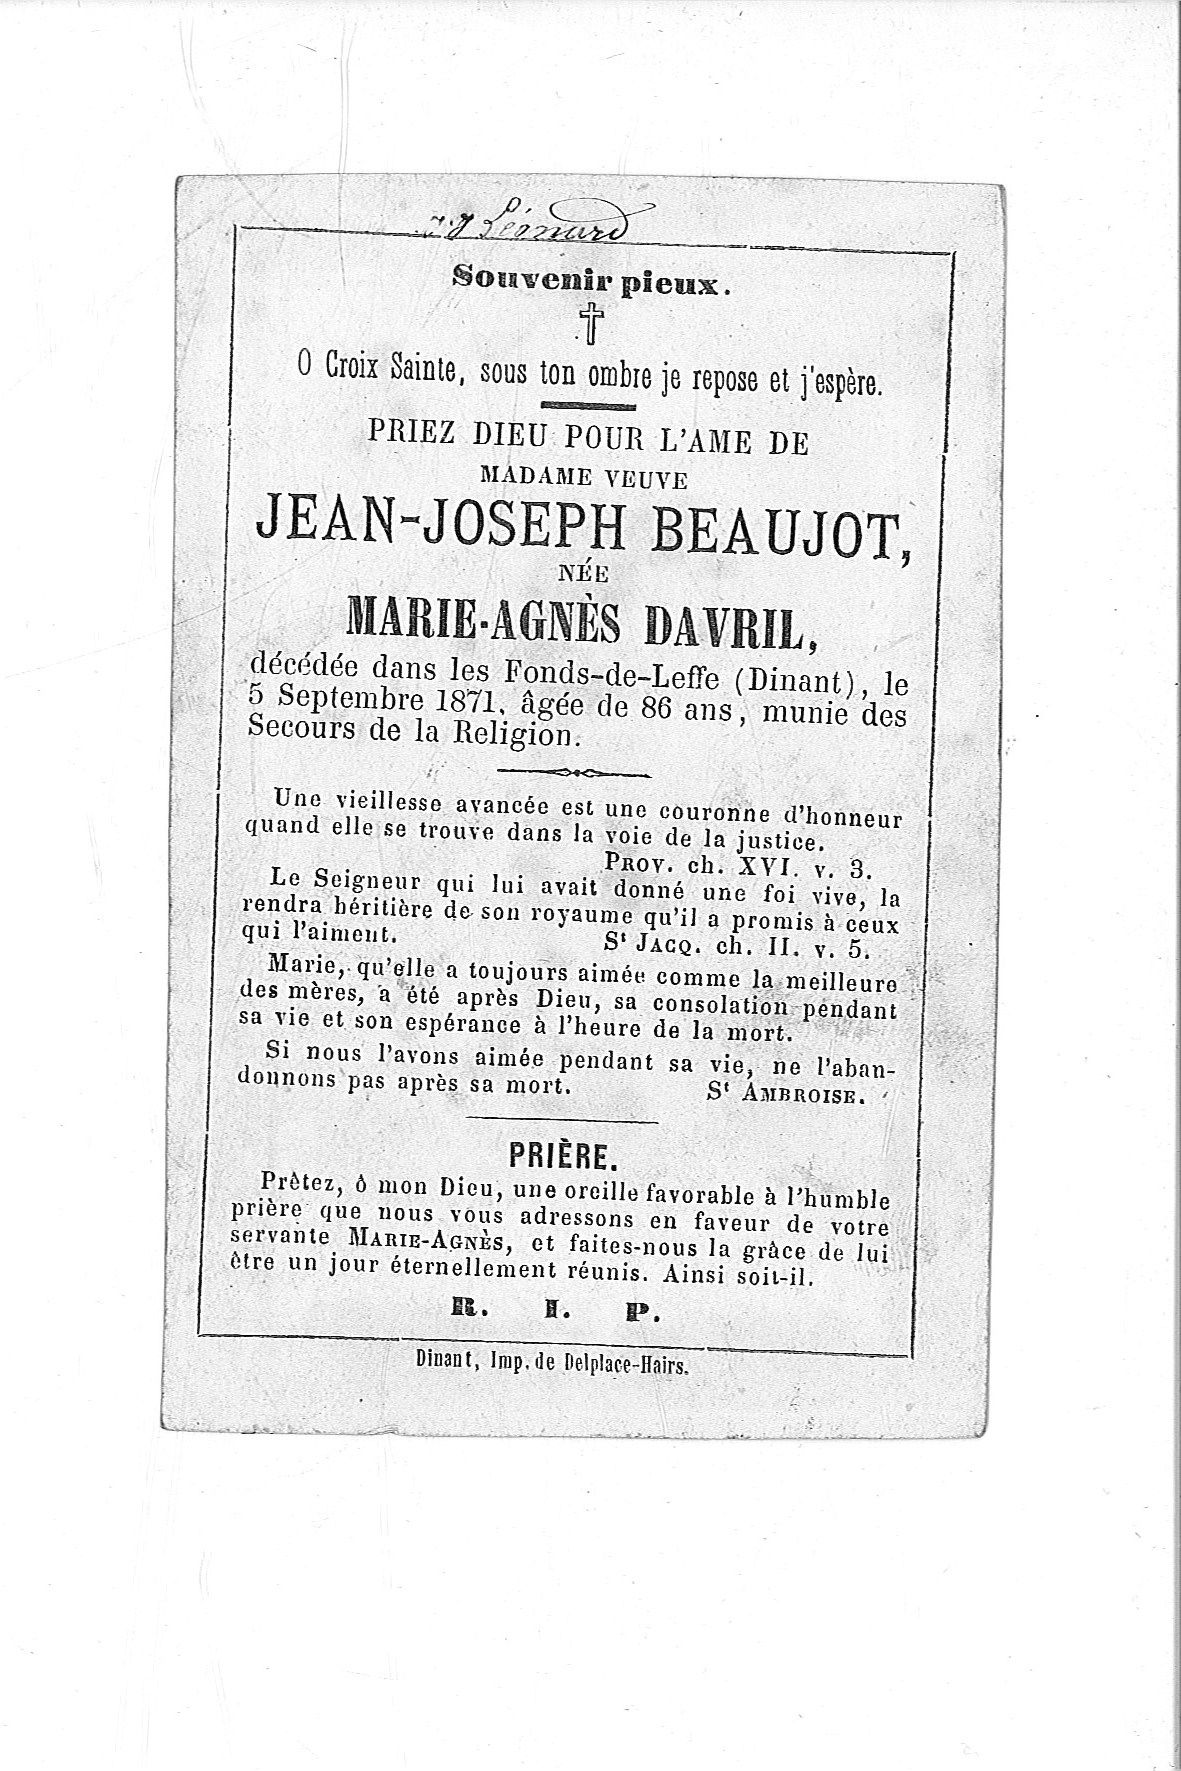 Jean-Joseph(1871)20090806155105_00029.jpg